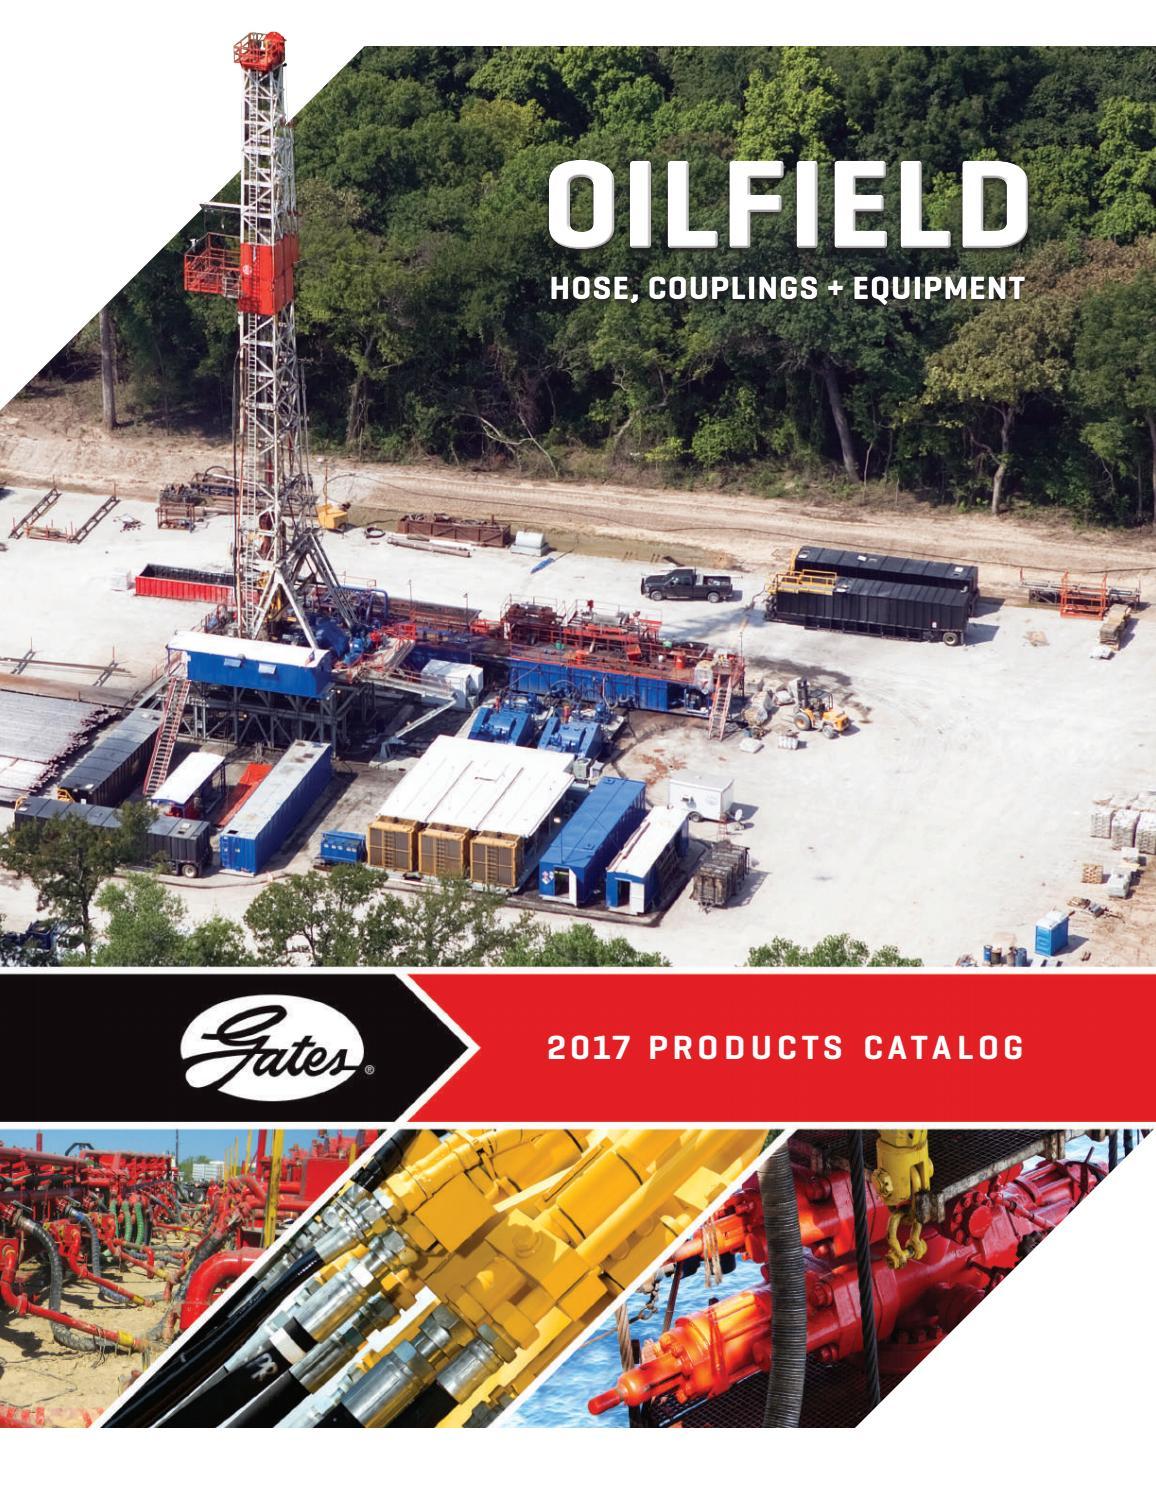 Gates 41100500 Oilfield Hose Black 4 ID 4 ID 150 psi Maximum Pressure